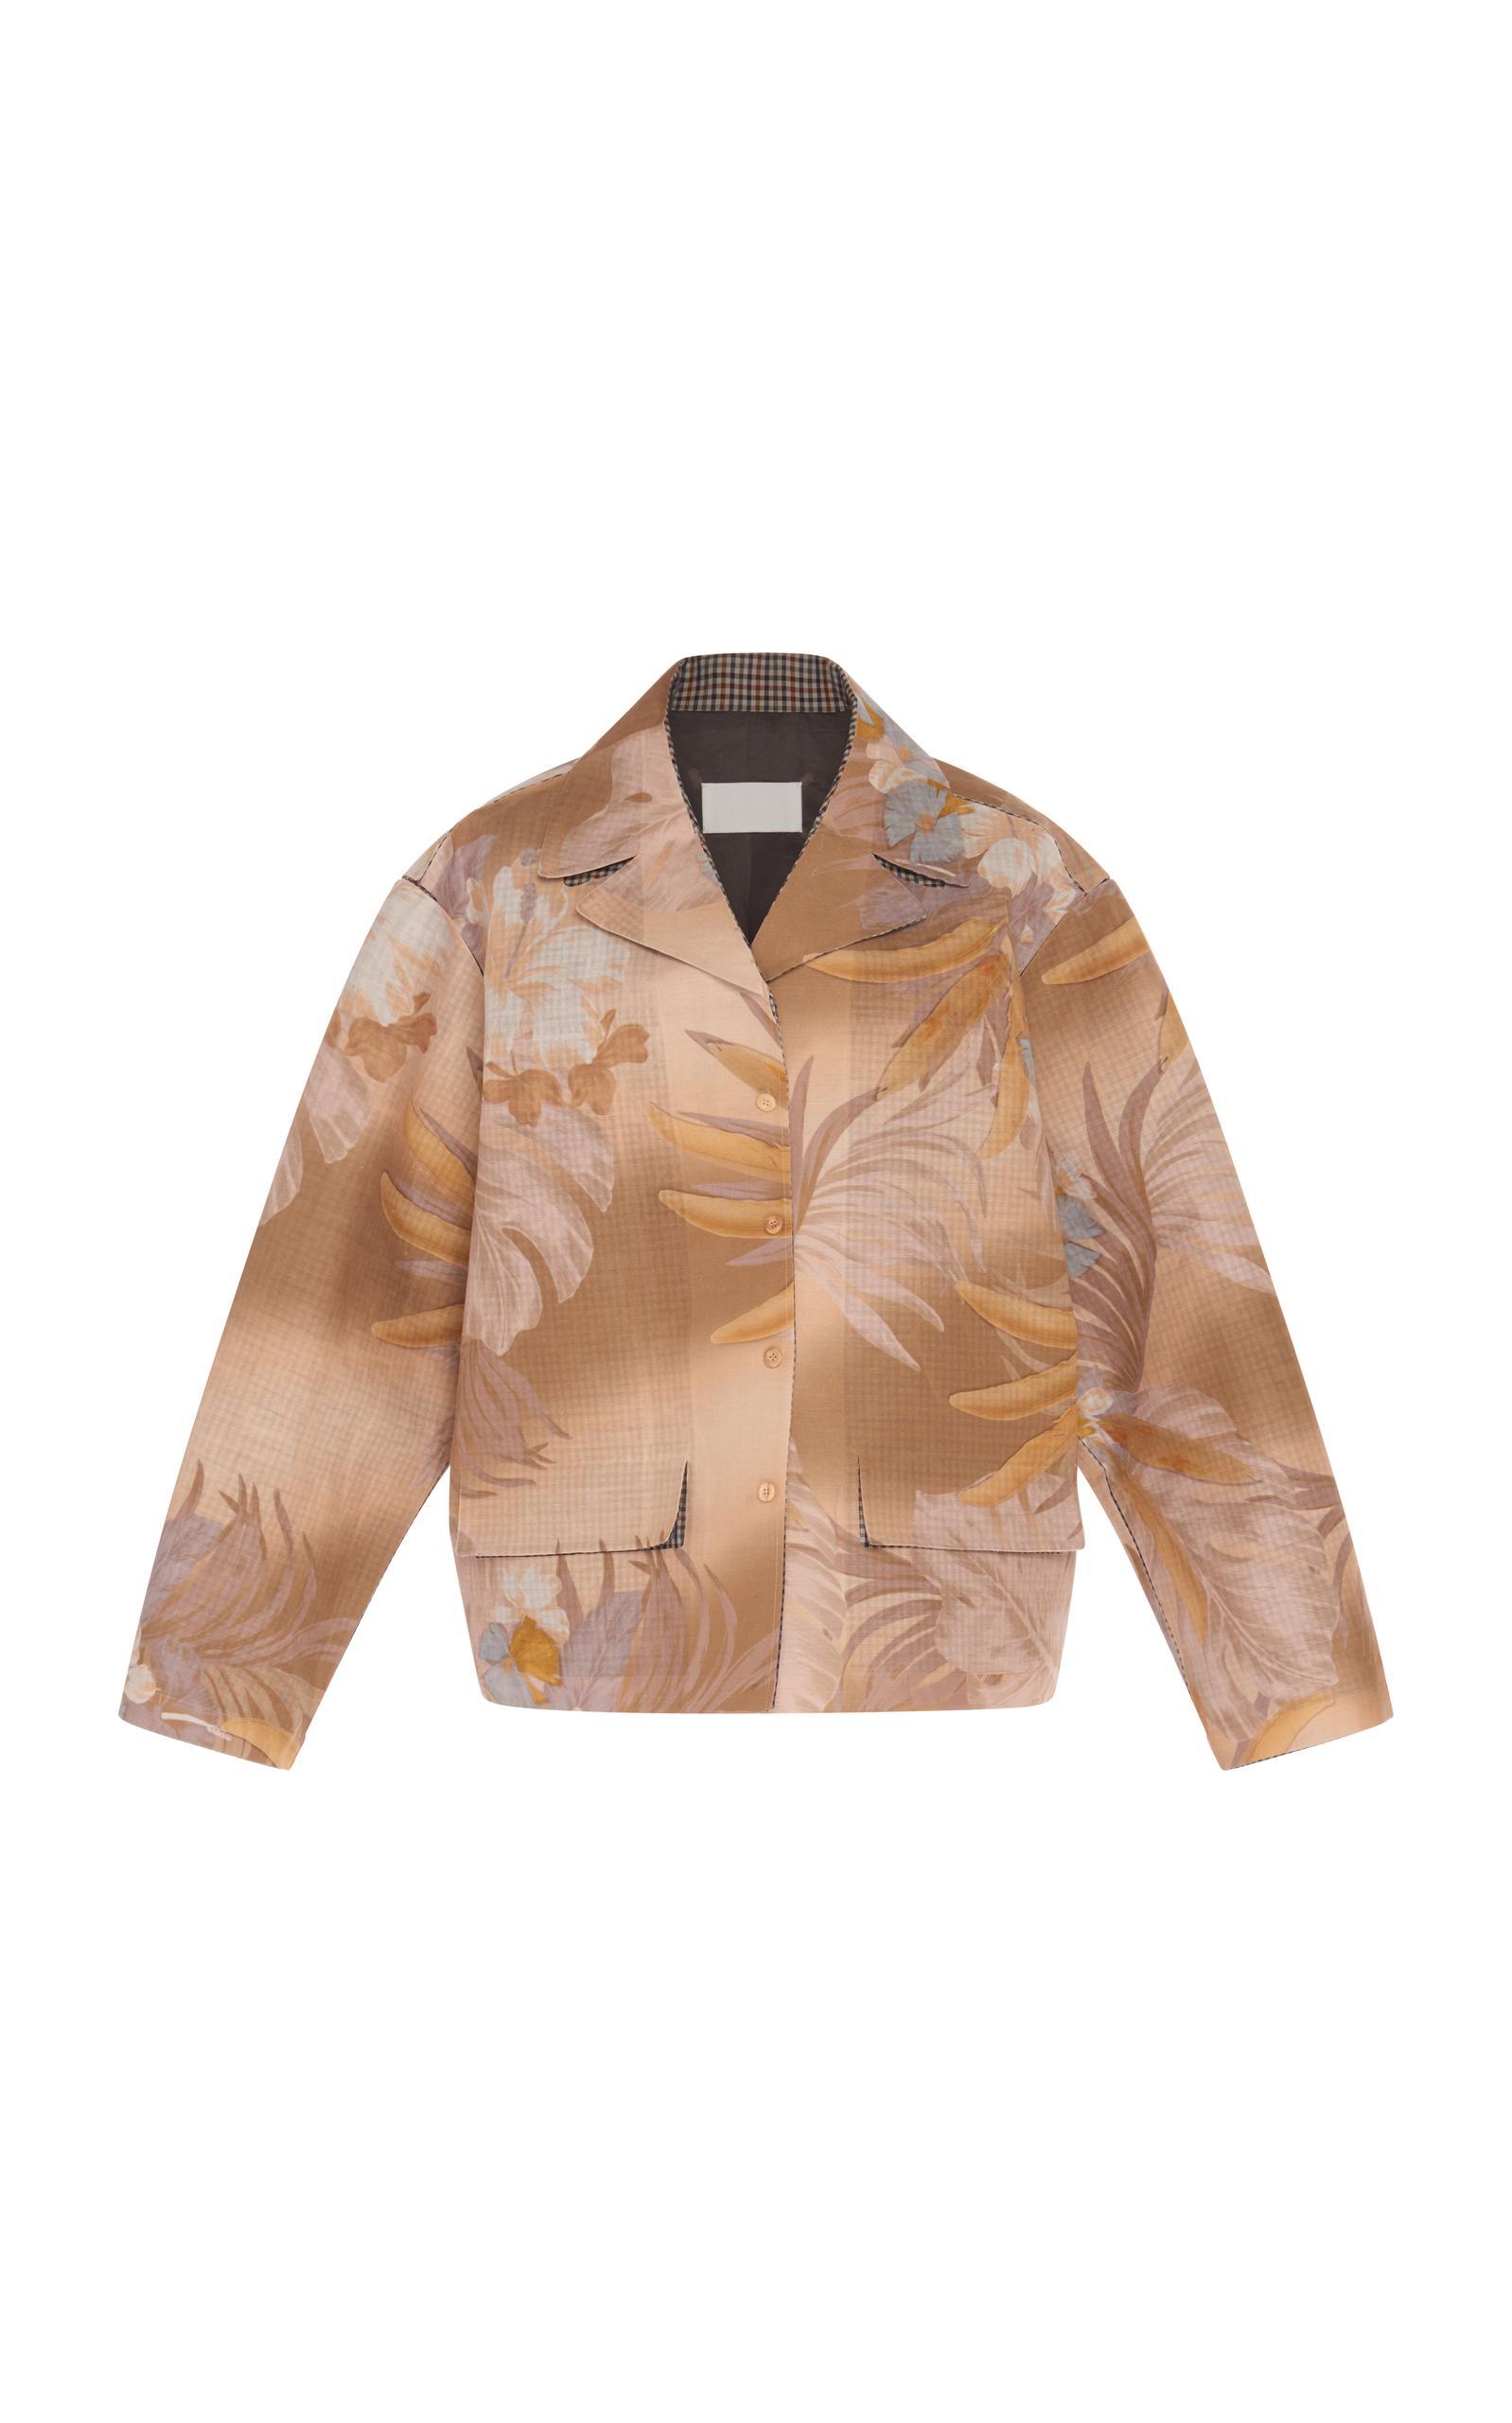 Maison Margiela Bonded Tropical Print Coat In Multi